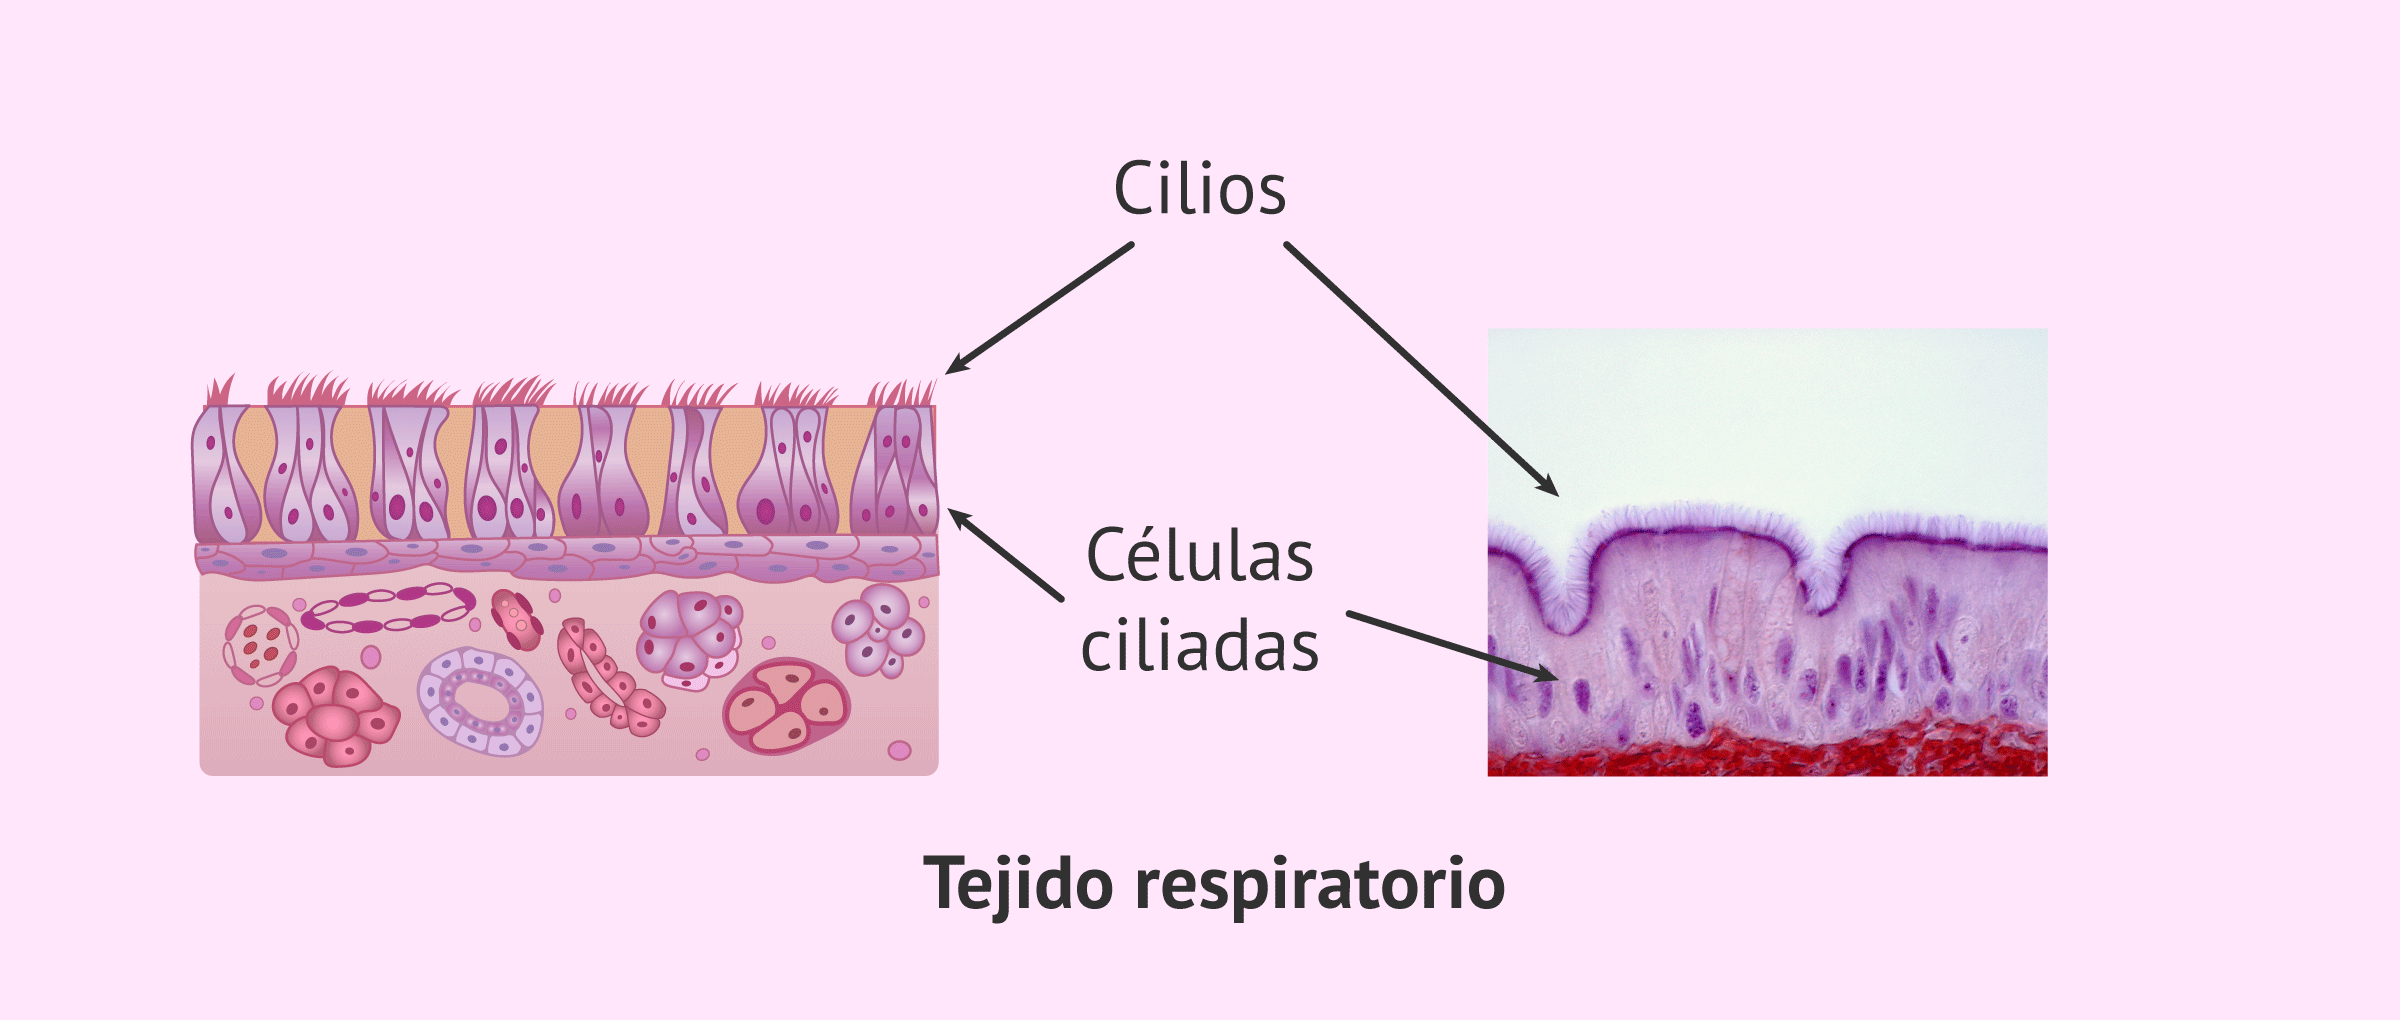 Epitelio ciliar humano